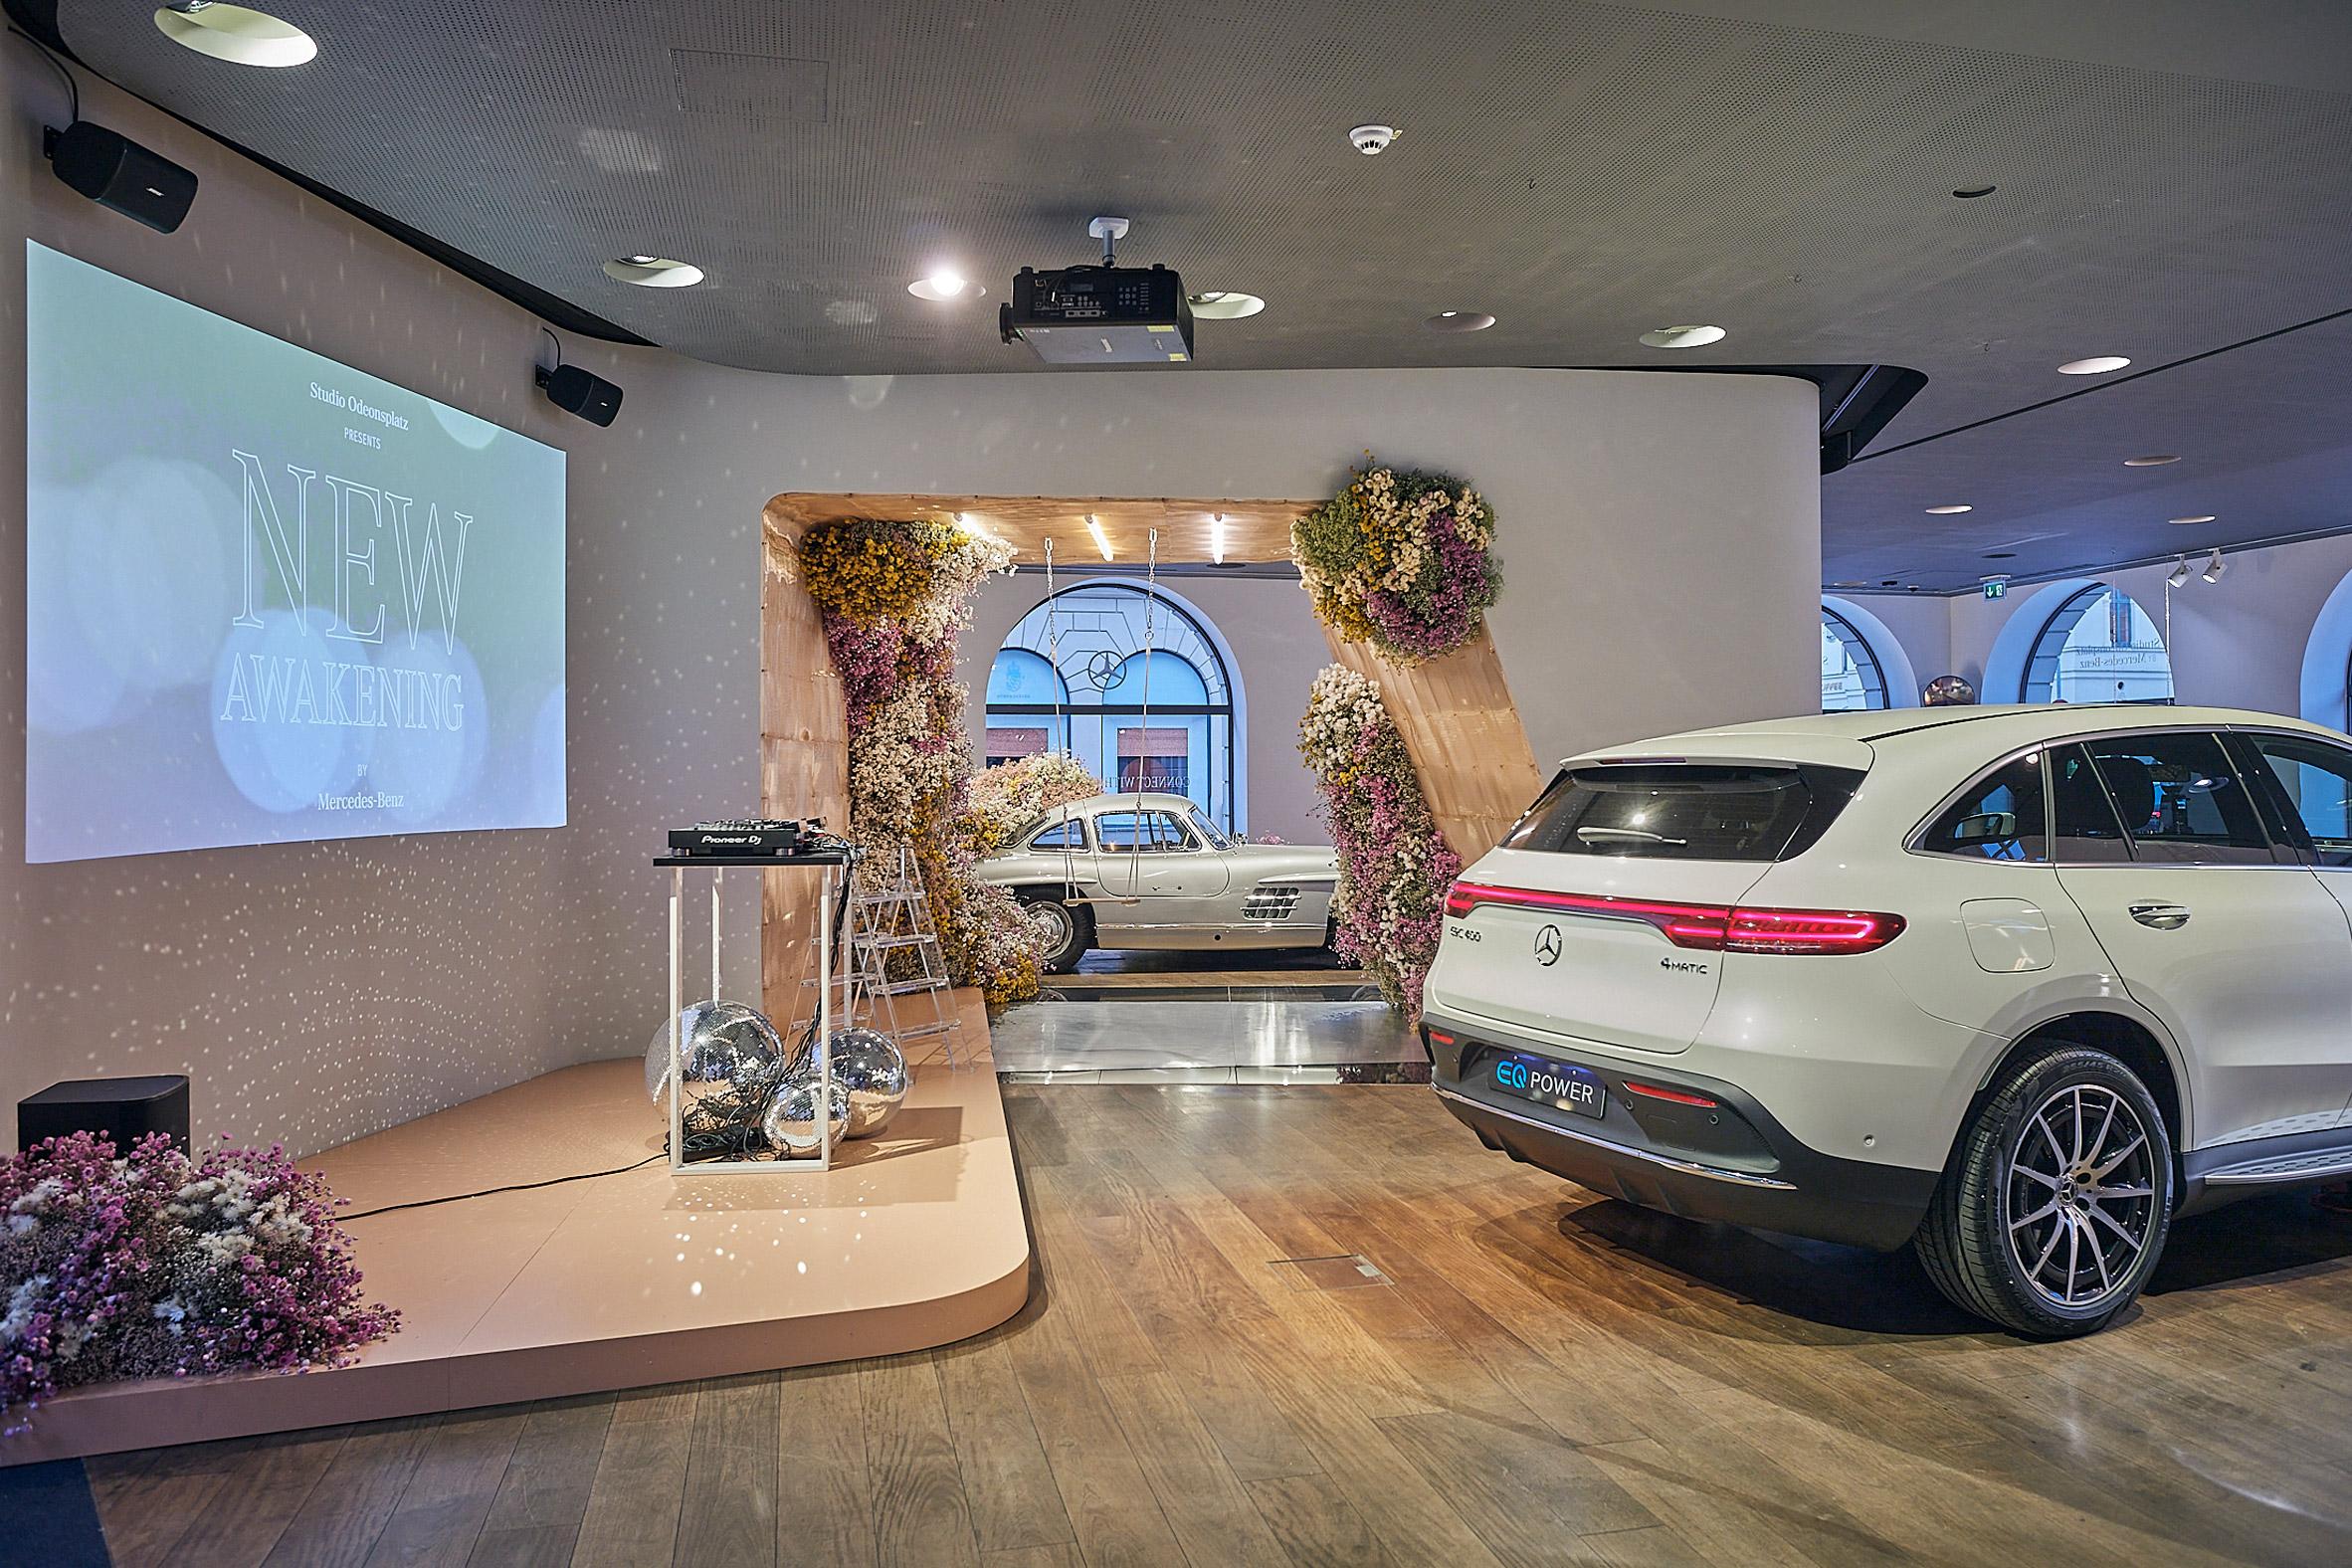 New Awakenings installation at Studio Odeonsplatz